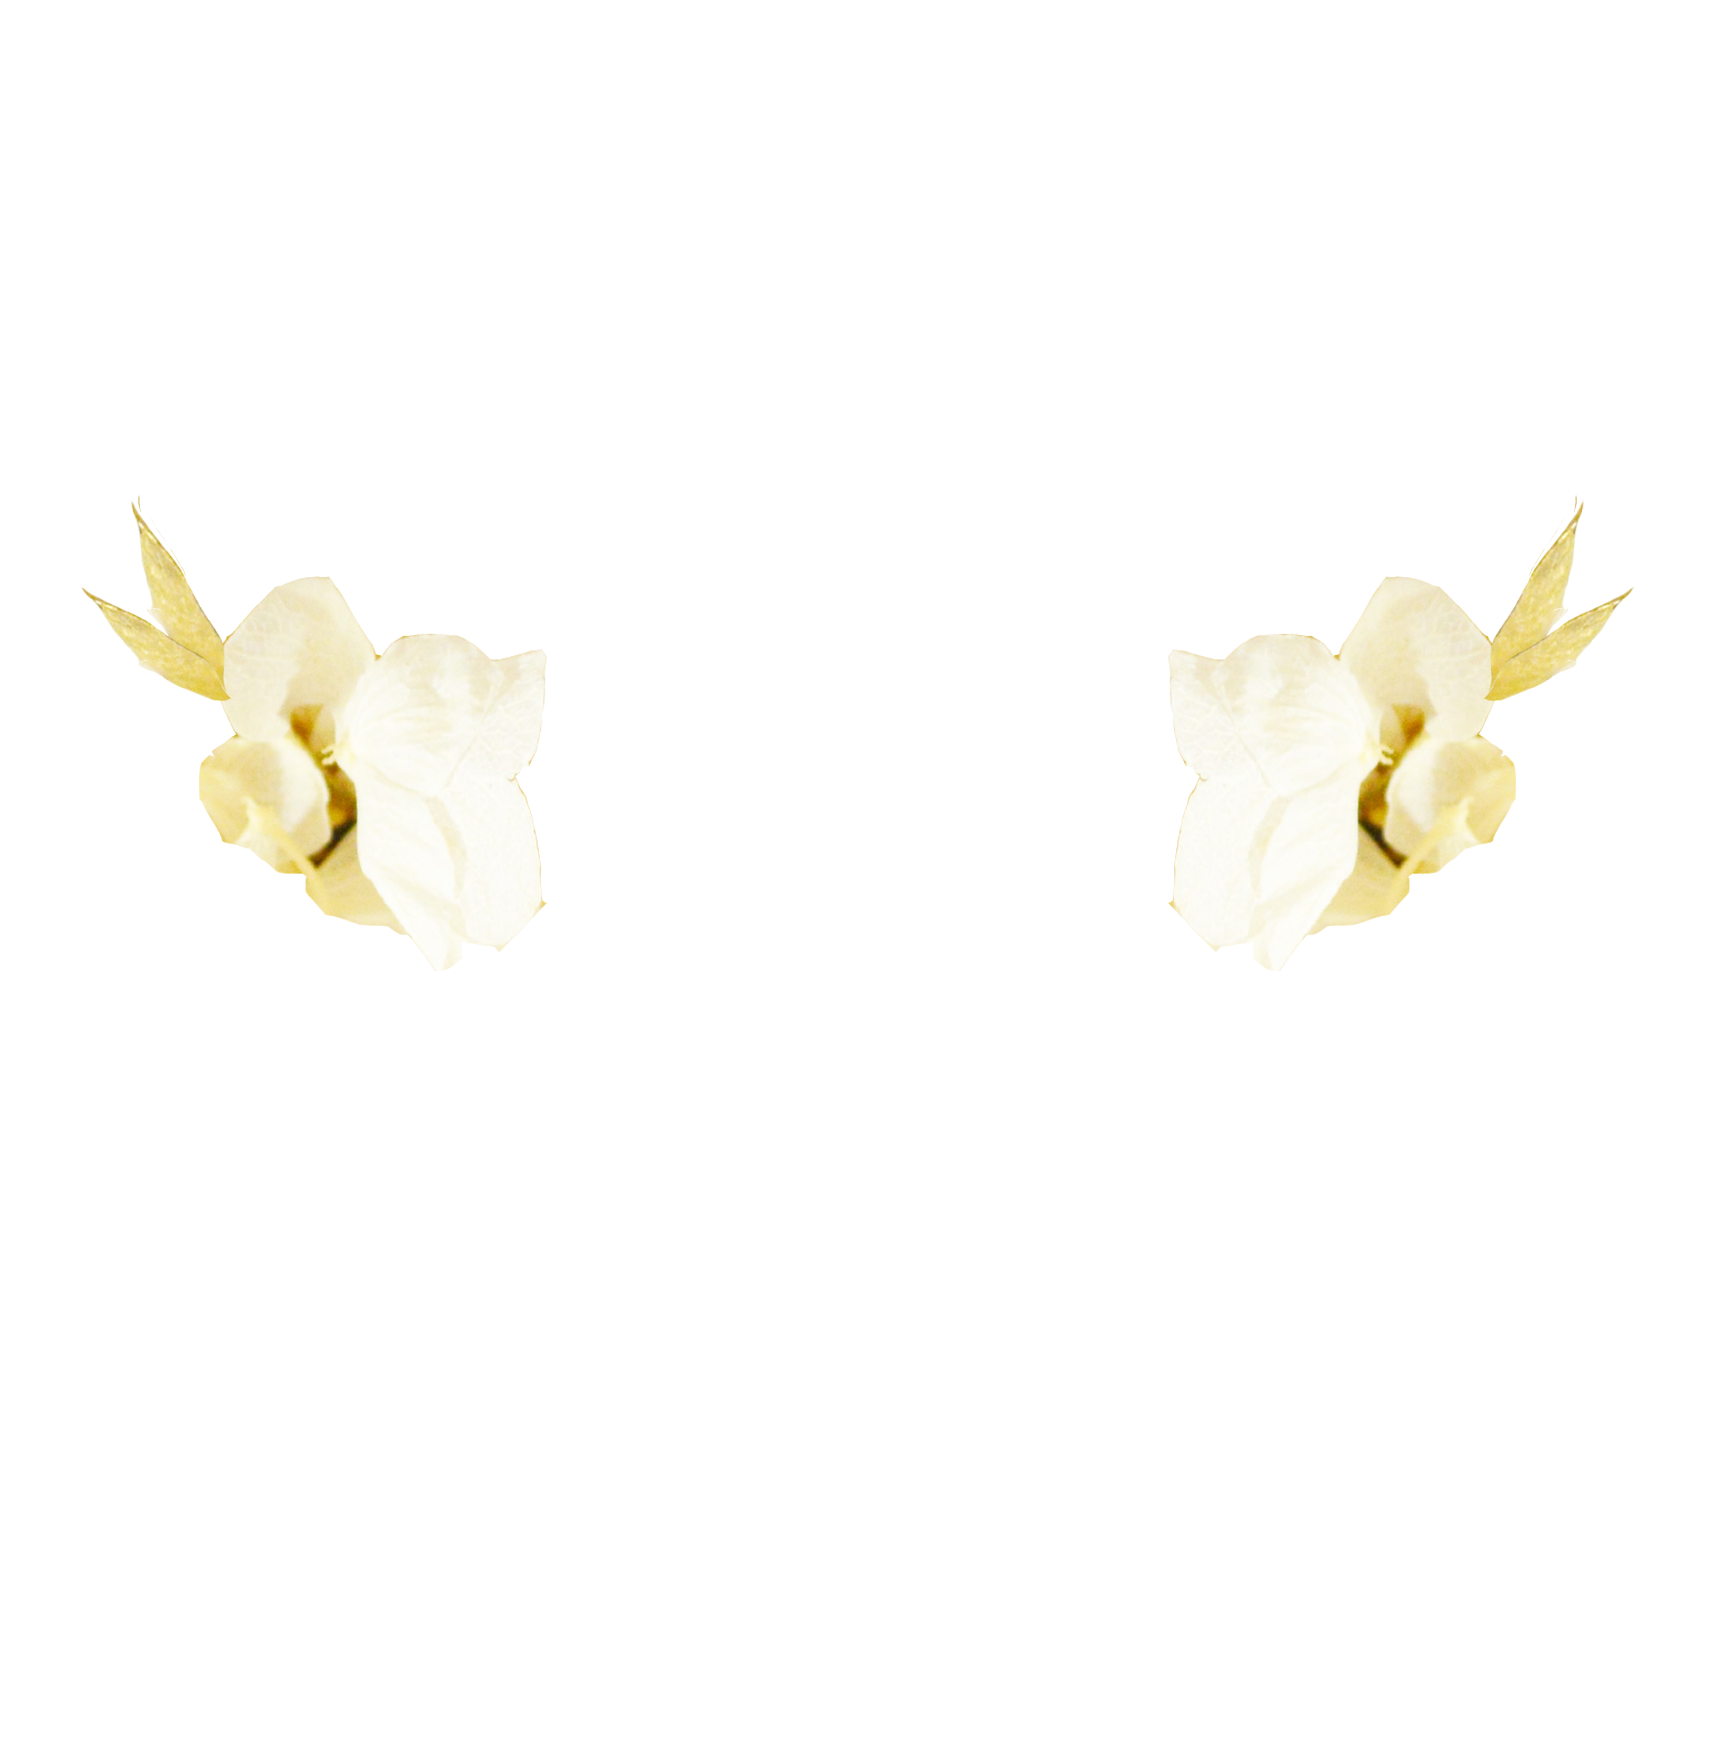 eucalyptus DORE + hortensias IVOIRE